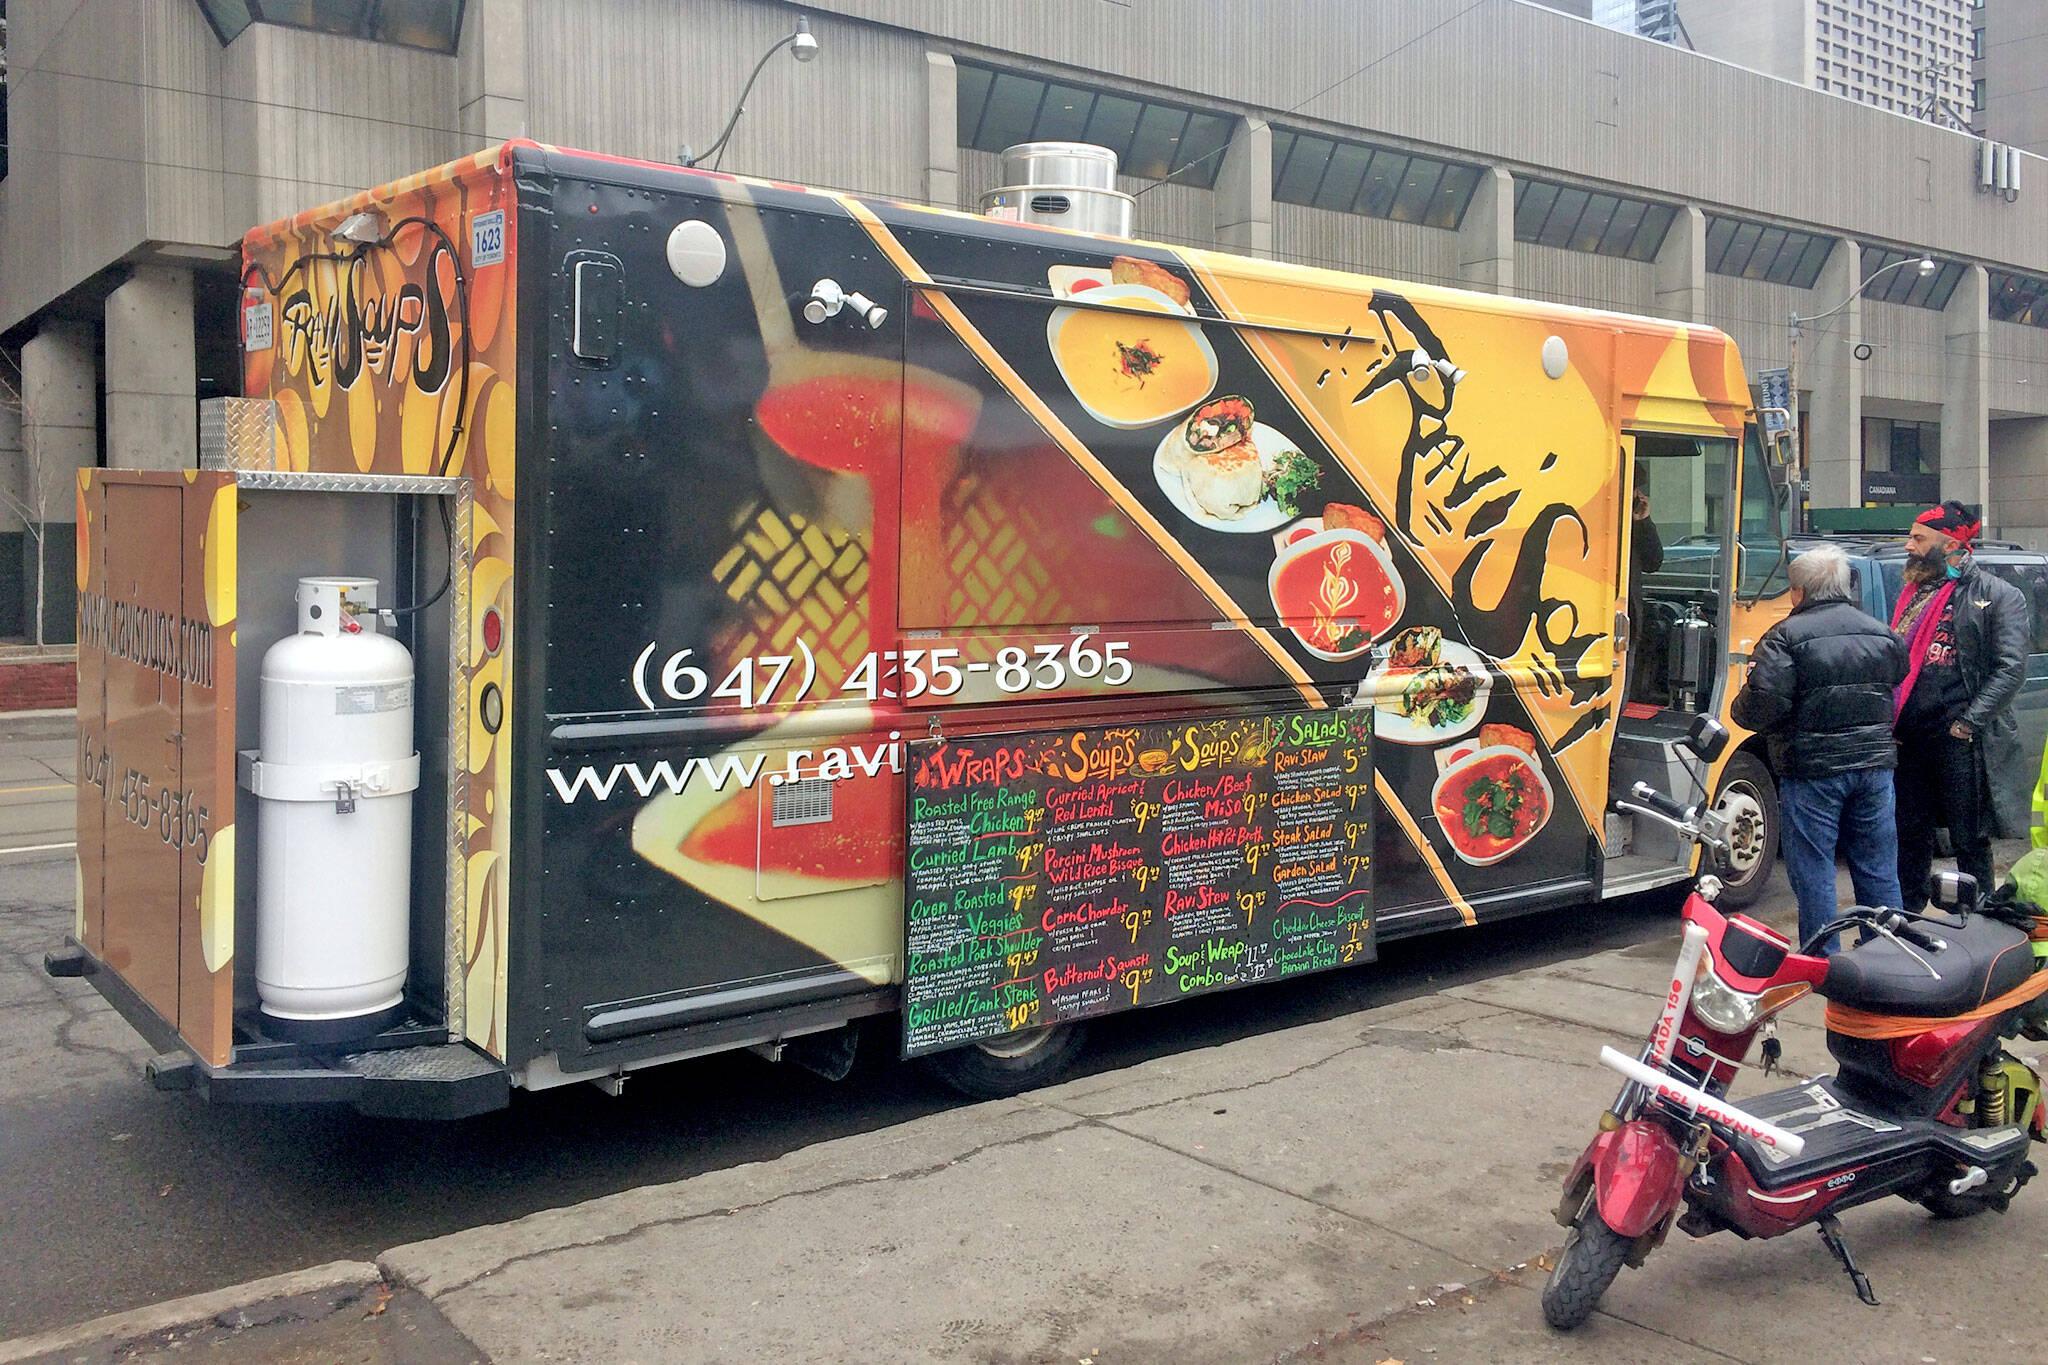 RaviSoups Food Truck